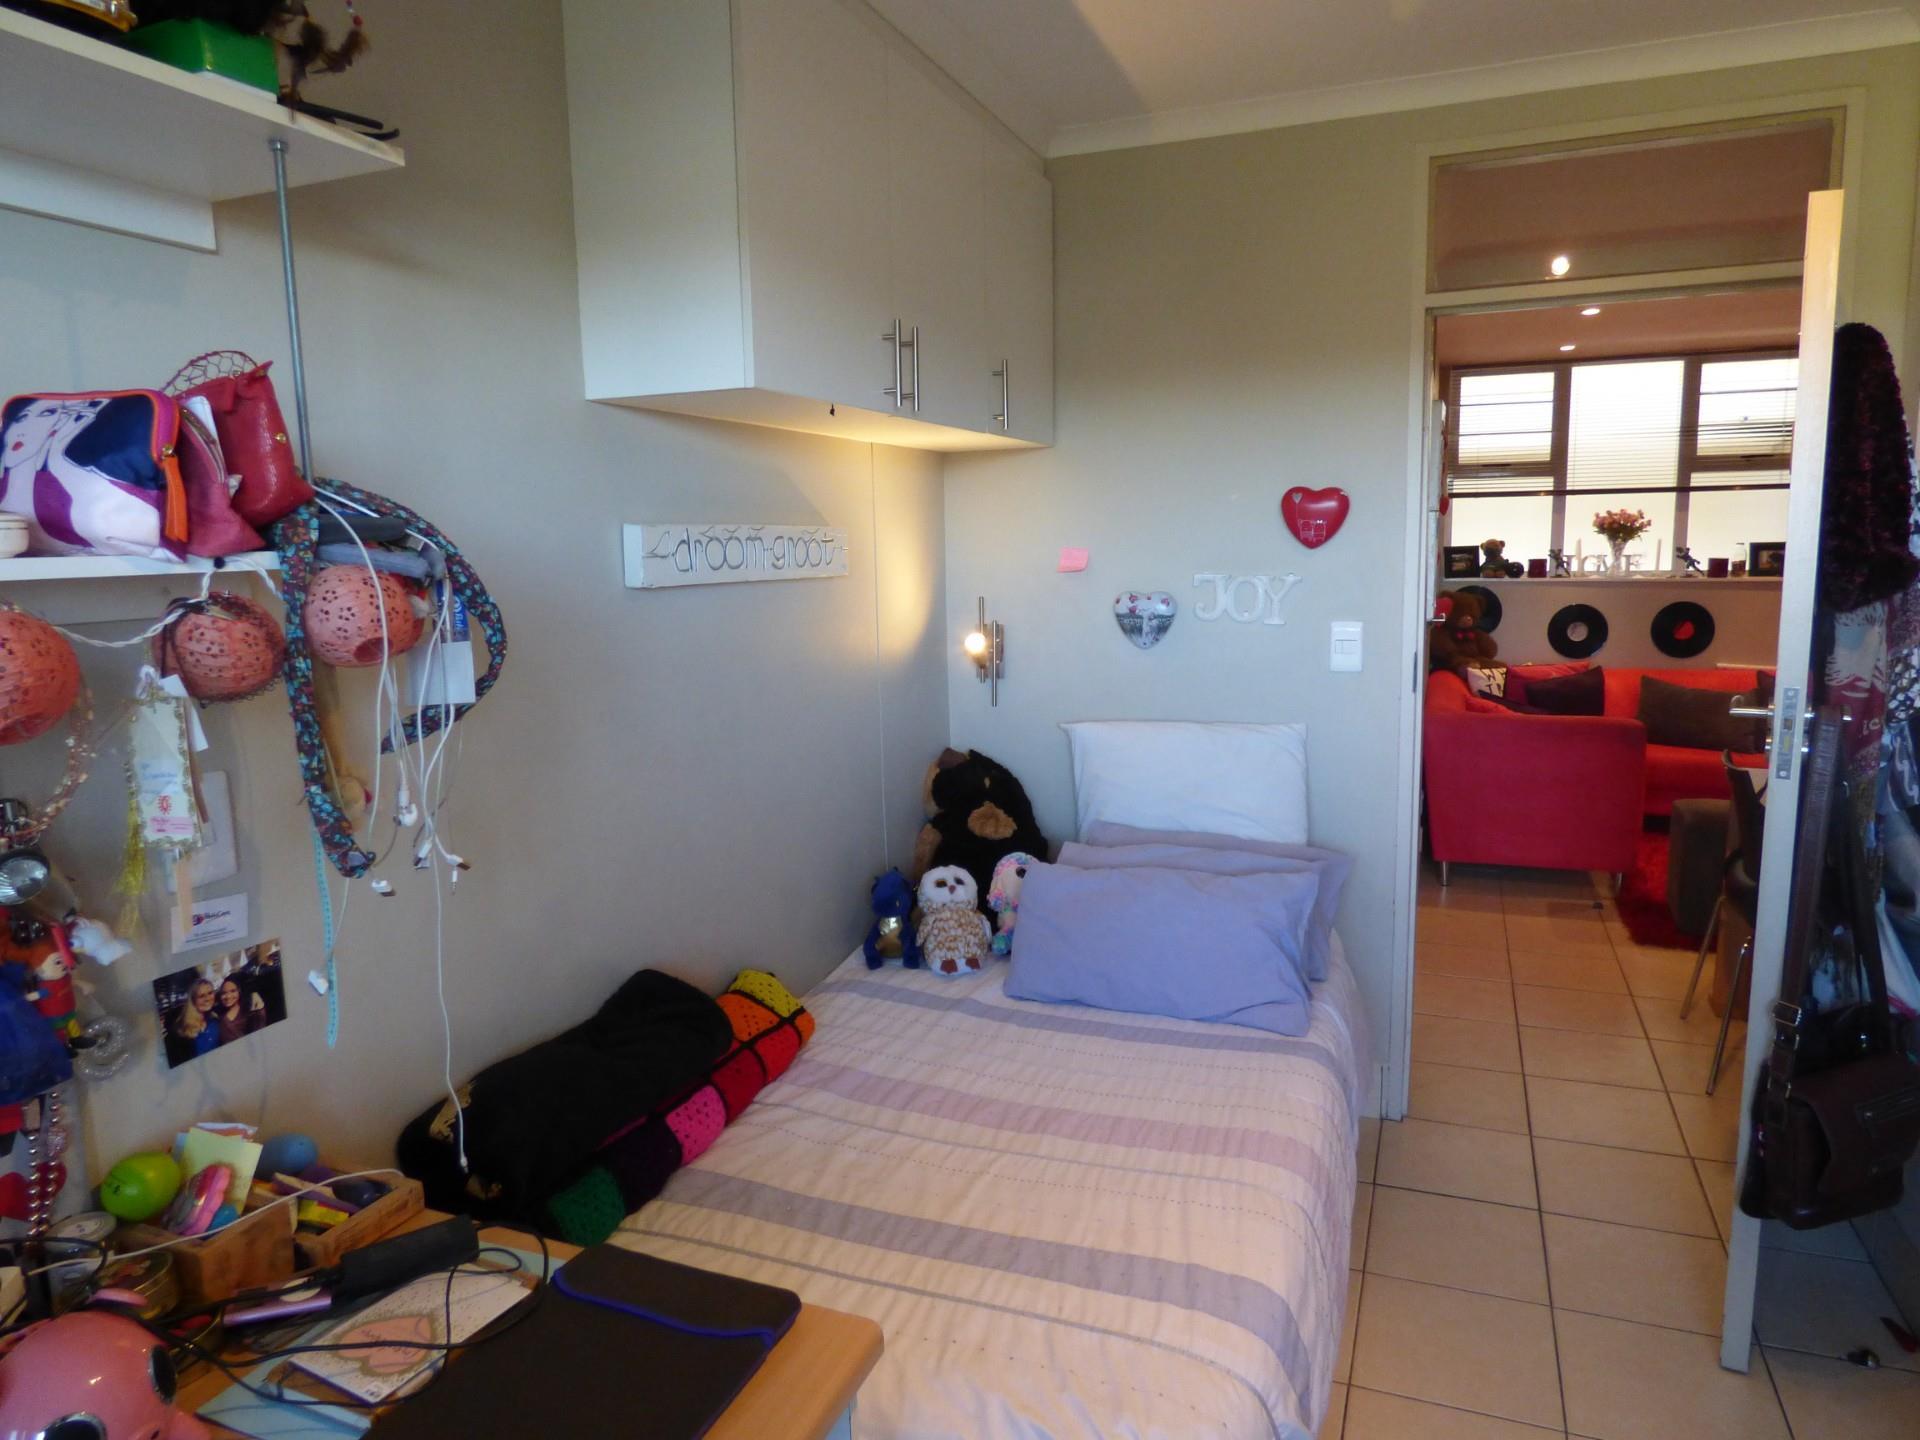 2 Bedroom Apartment / Flat For Sale in Universitas